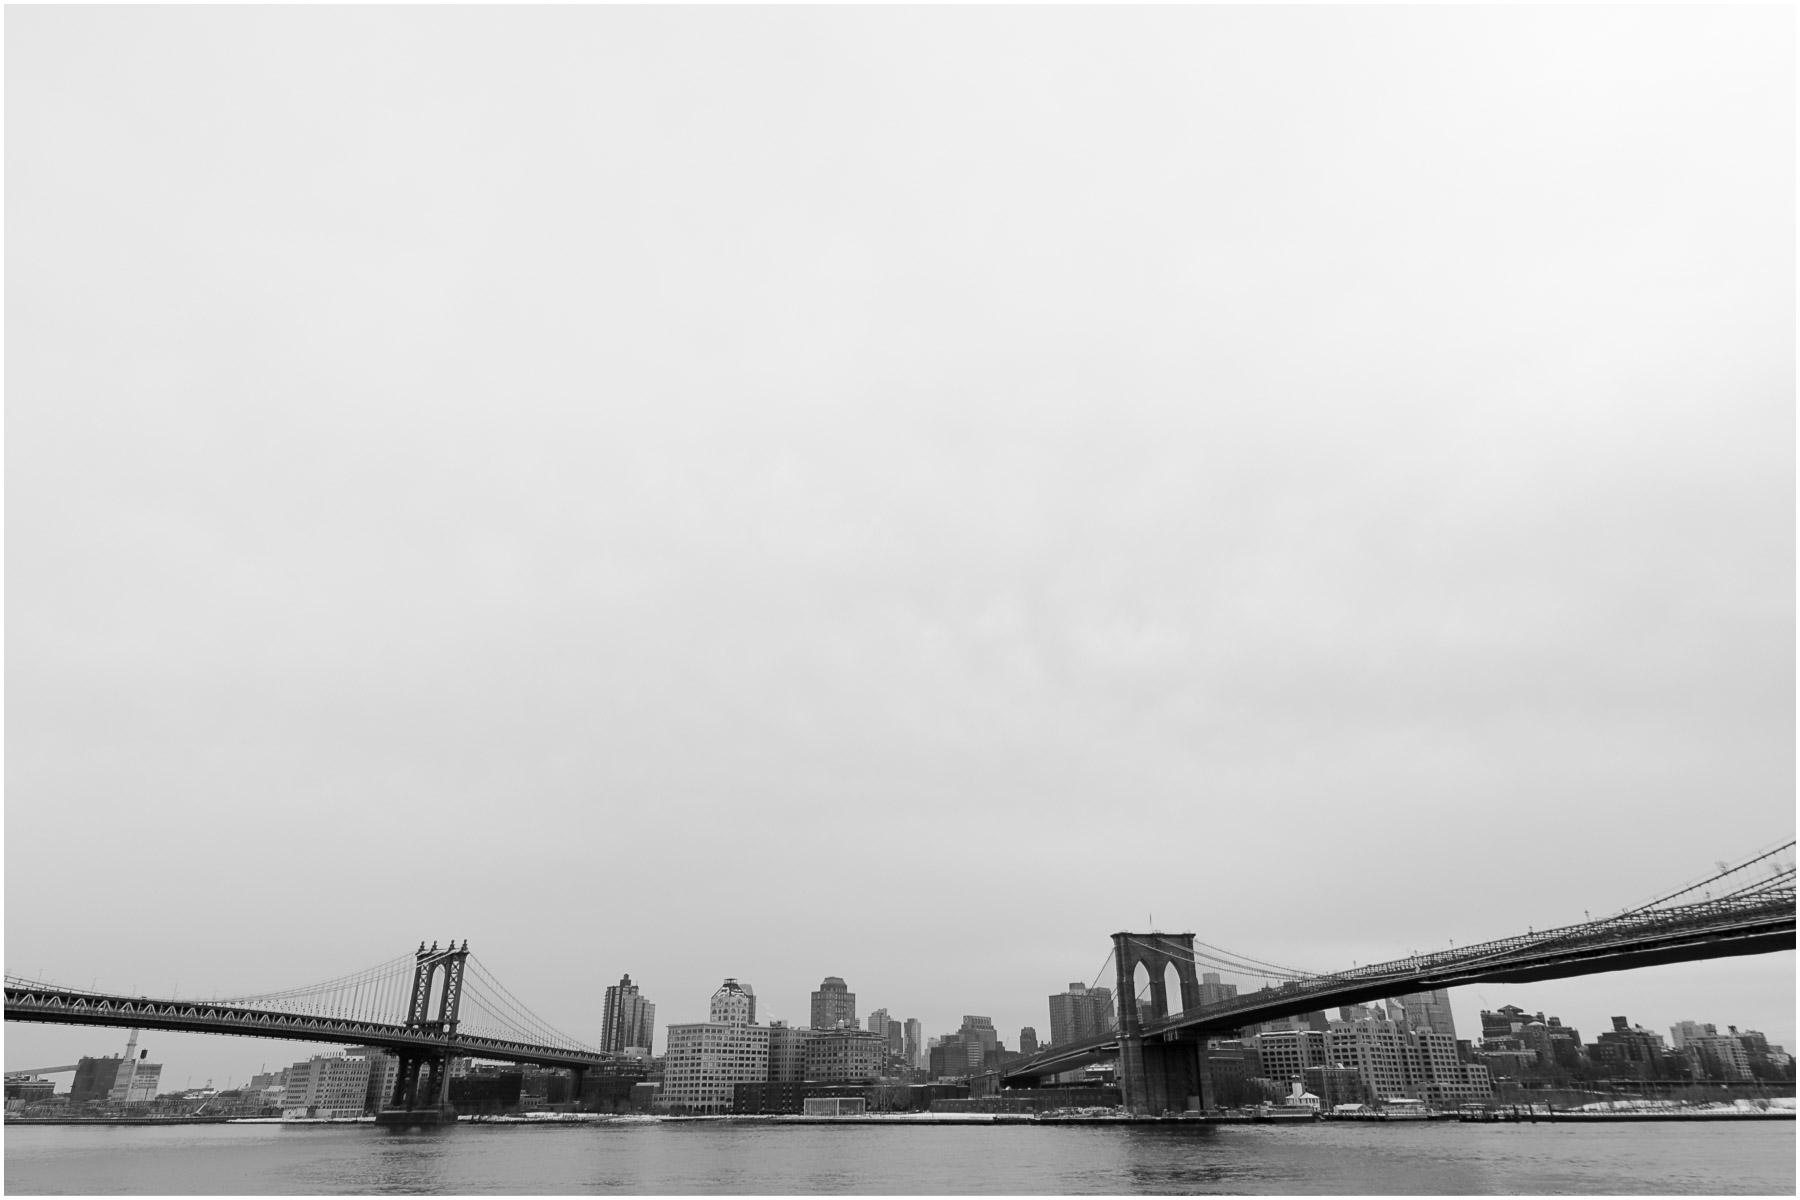 FDR-Memorial-Roosevelt-Island_2.jpg